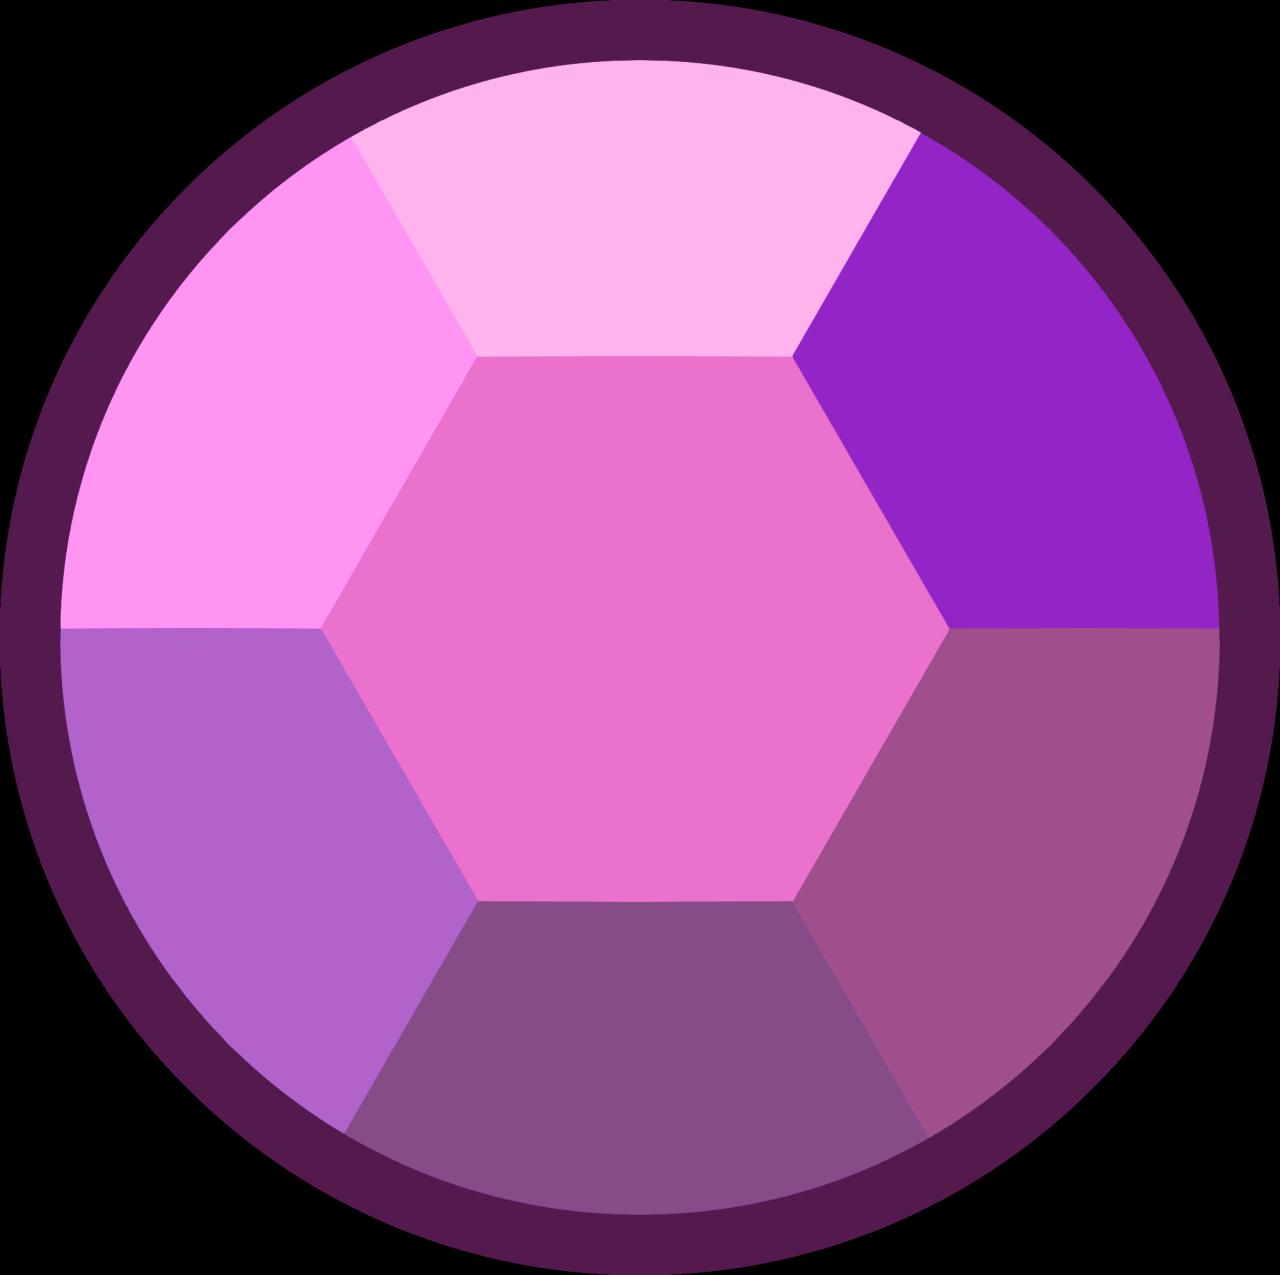 Image cranberry zandrite gemstone. Gem clipart amethyst